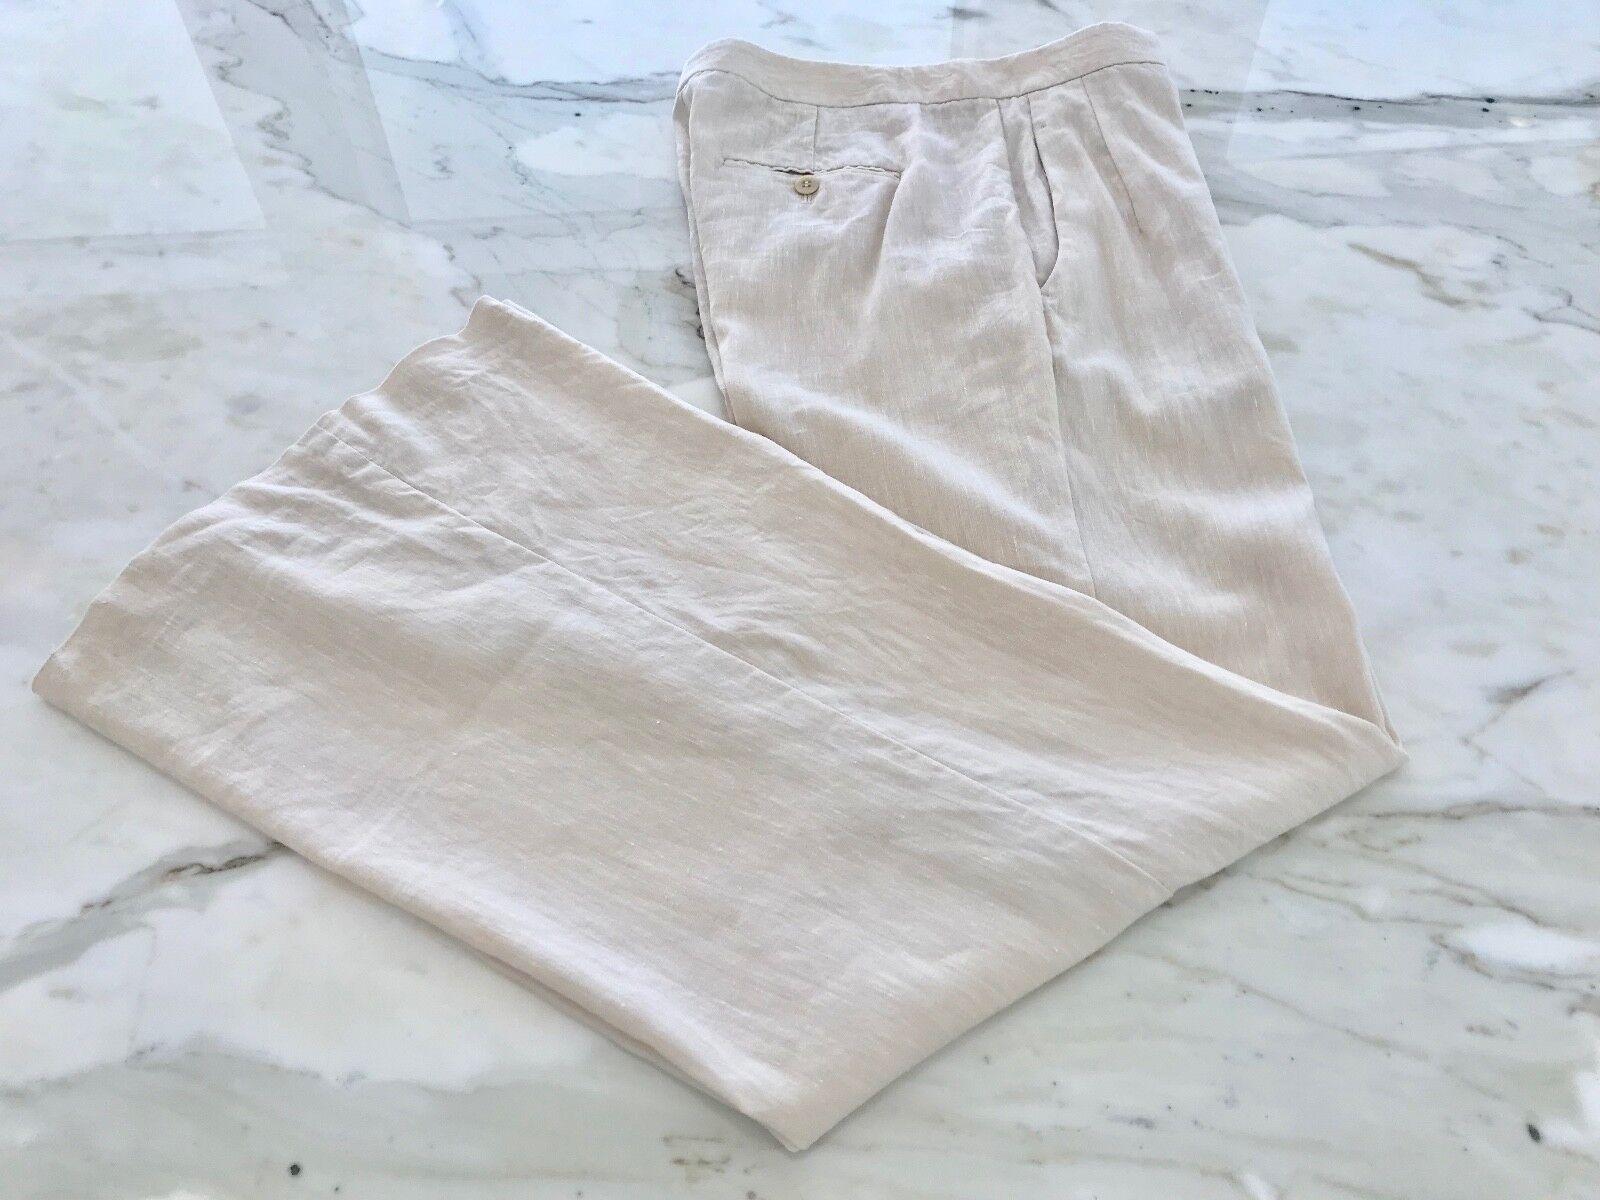 THEORY OATMEAL CREAM WOOL LINEN ELASTANE FLARE PANTS STYLE B0601206 SIZE 6